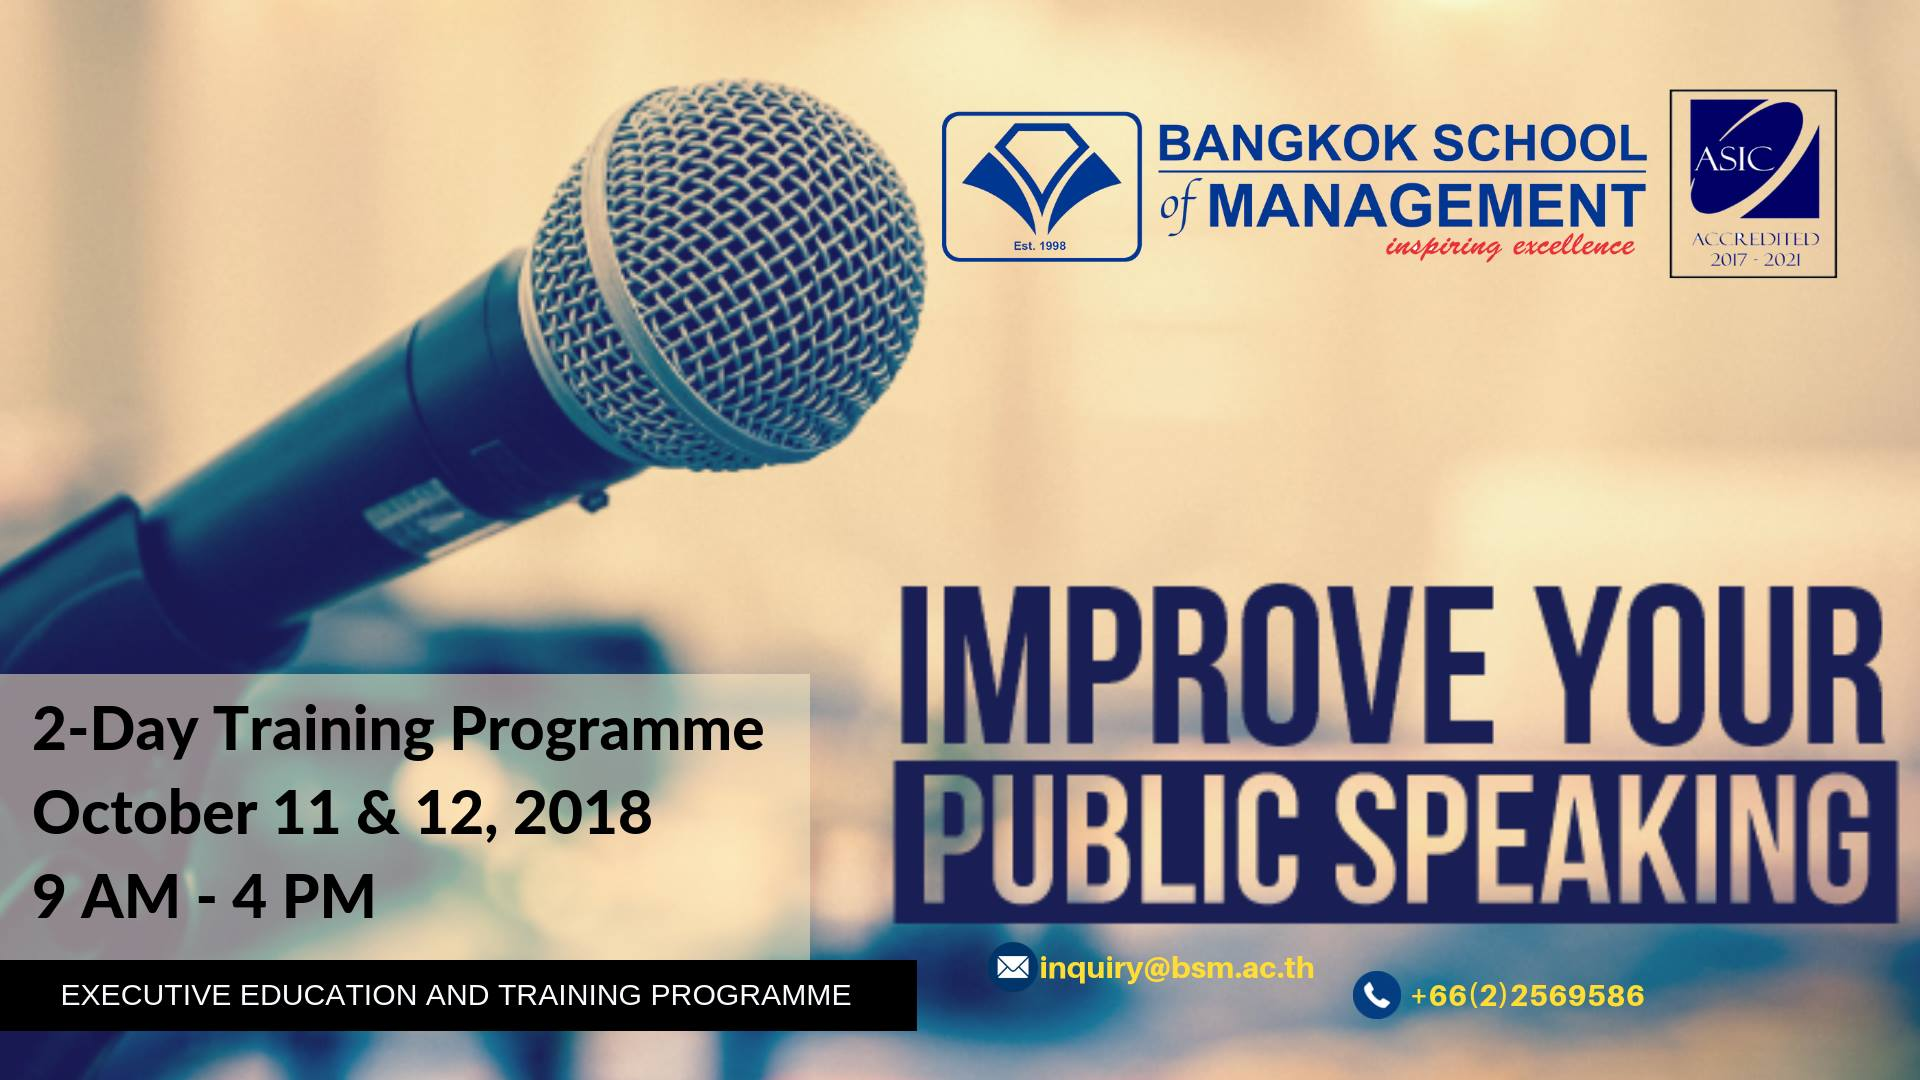 Date: October 11 &#8211; 12<br></br>Public Speaking